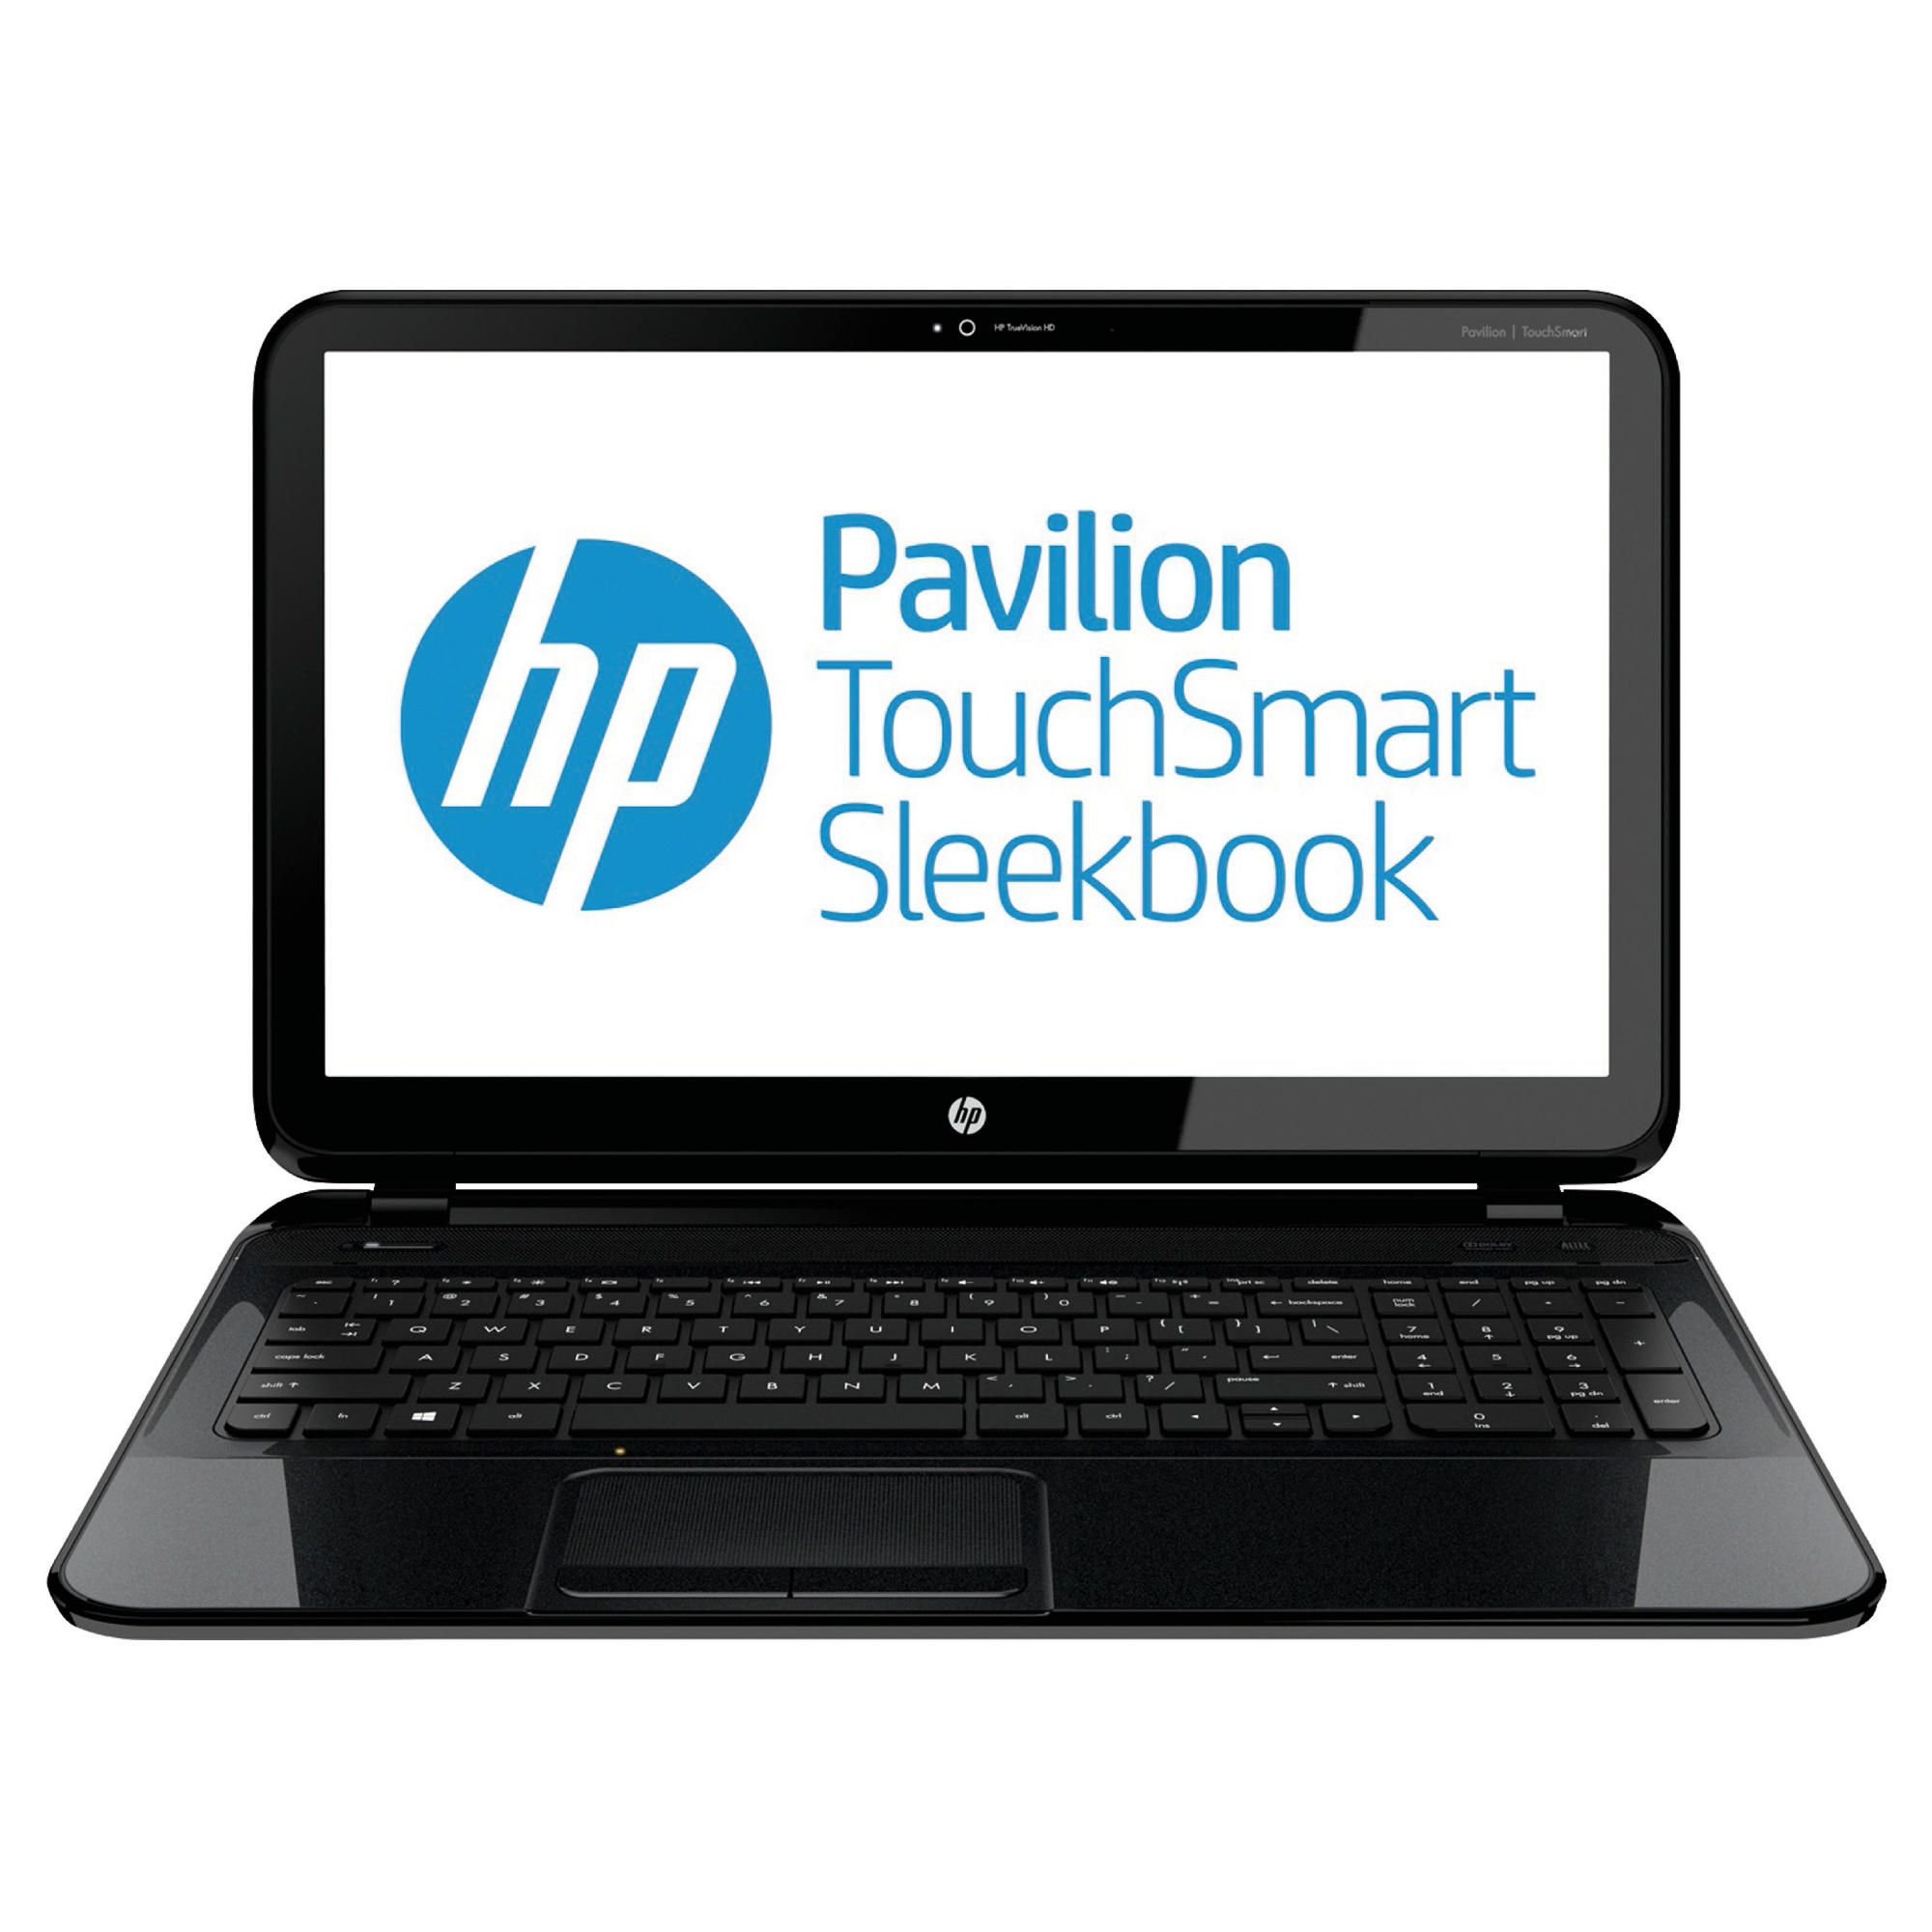 HP Pavilion TouchSmart 15-b129sa Sleekbook at Tesco Direct